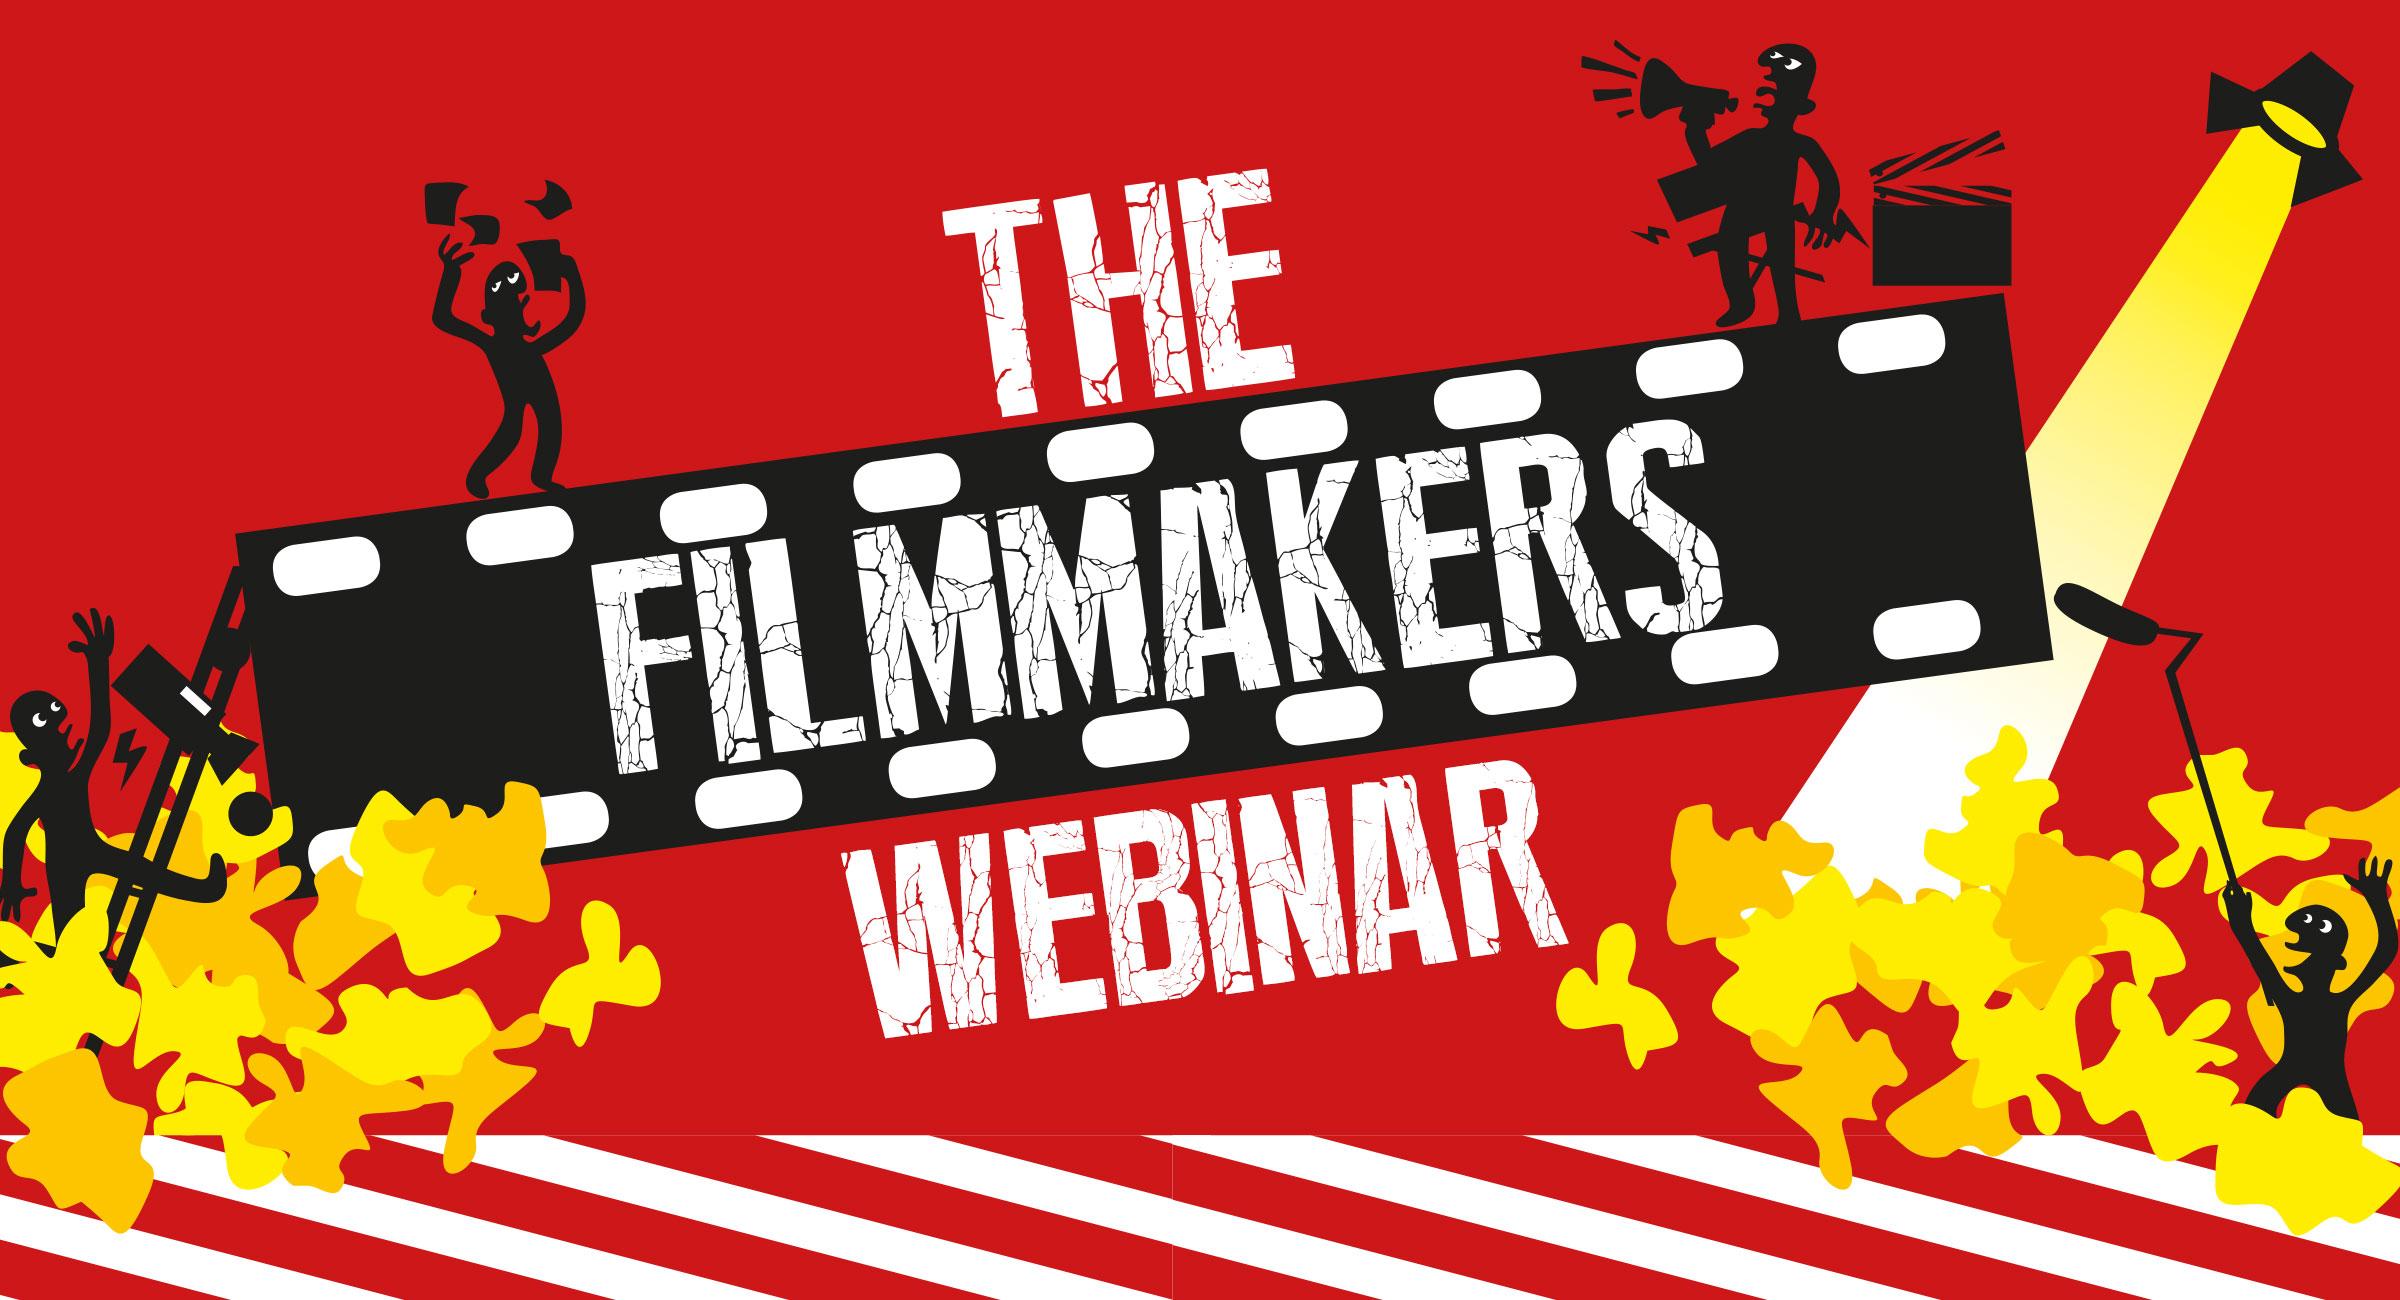 The Flmmakers' Webinar.